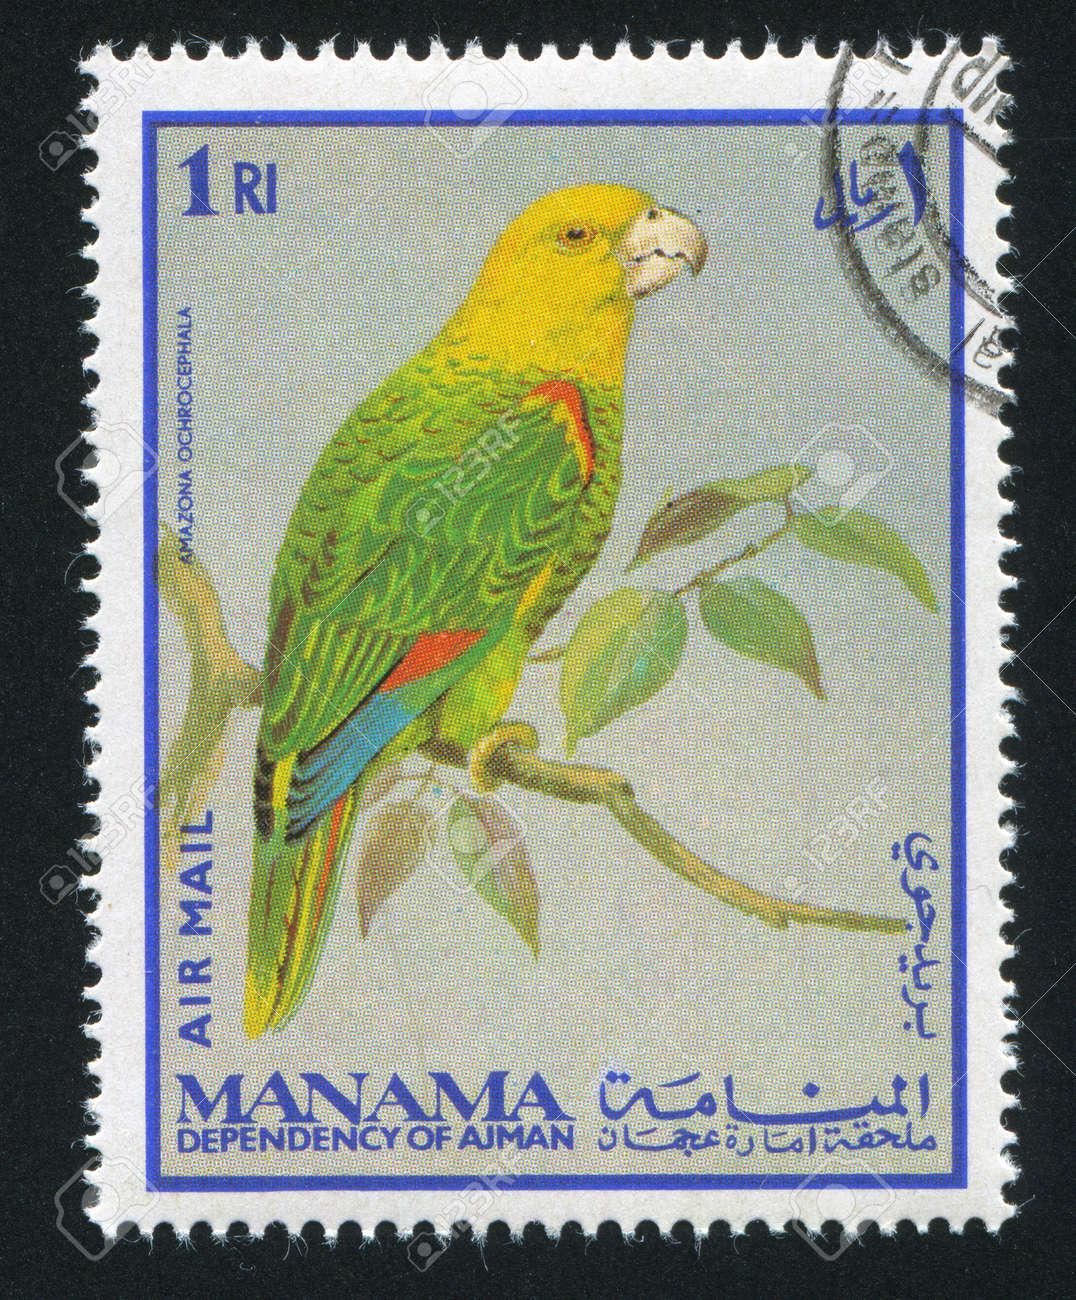 MANAMA - CIRCA 1976: stamp printed by Manama, shows Yellow-crowned Amazon Parrot, circa 1976 Stock Photo - 16745435